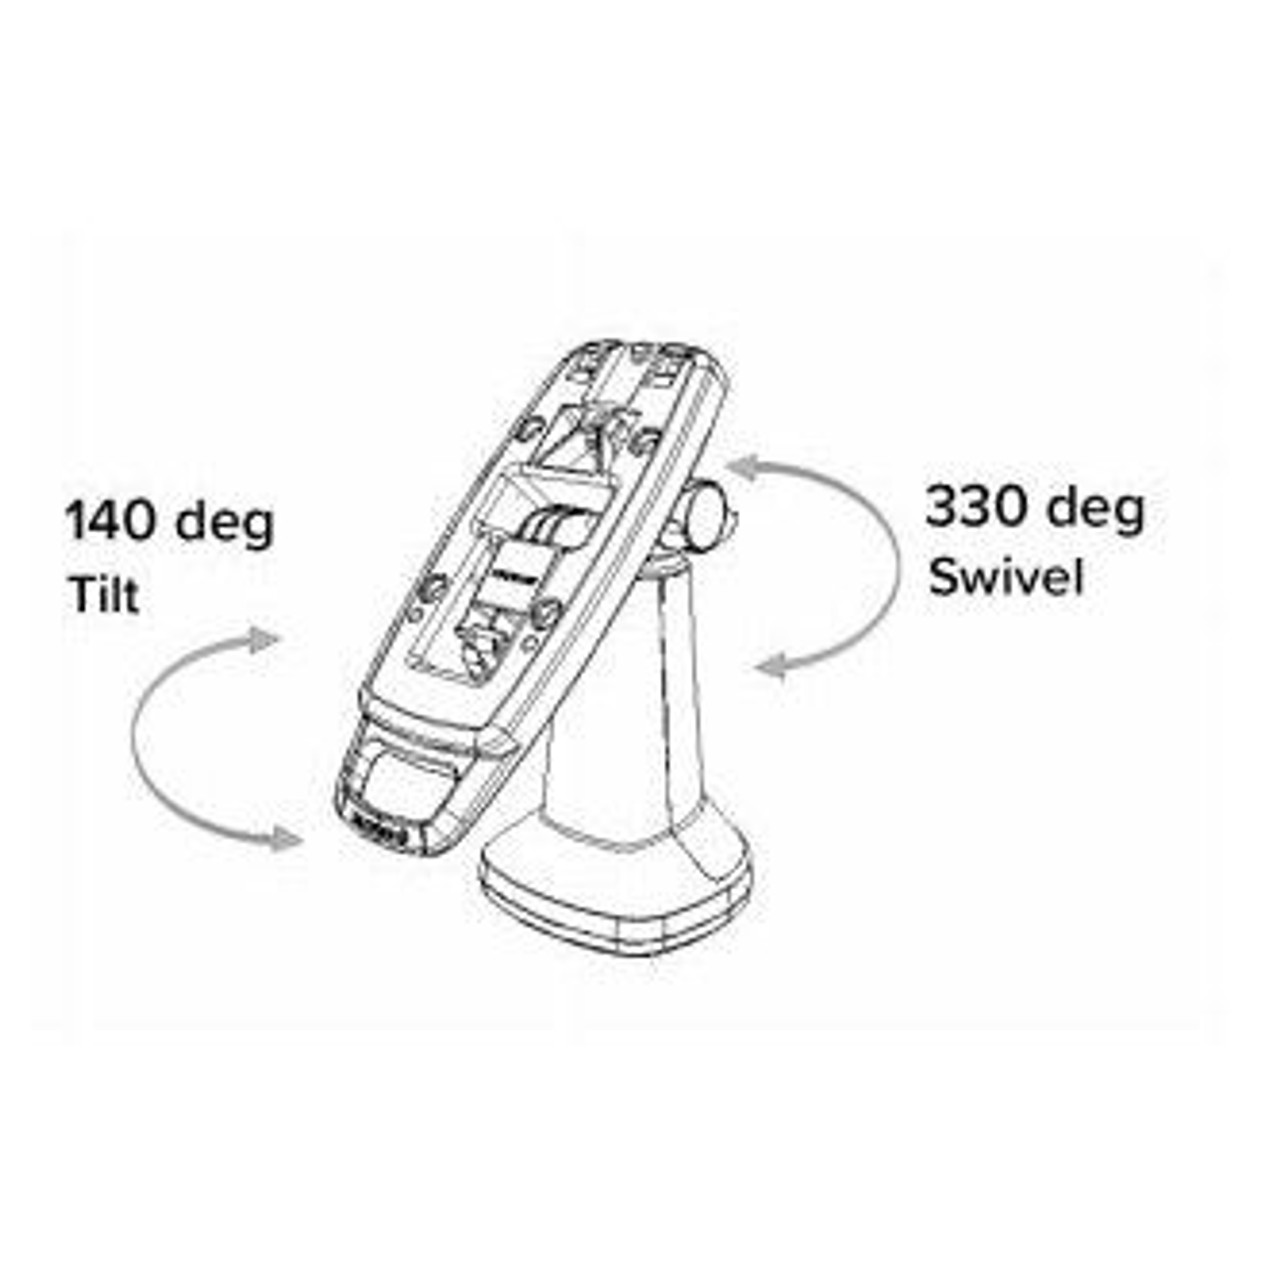 PAX S300 Tailwind FlexiPole Plus Locking Stand